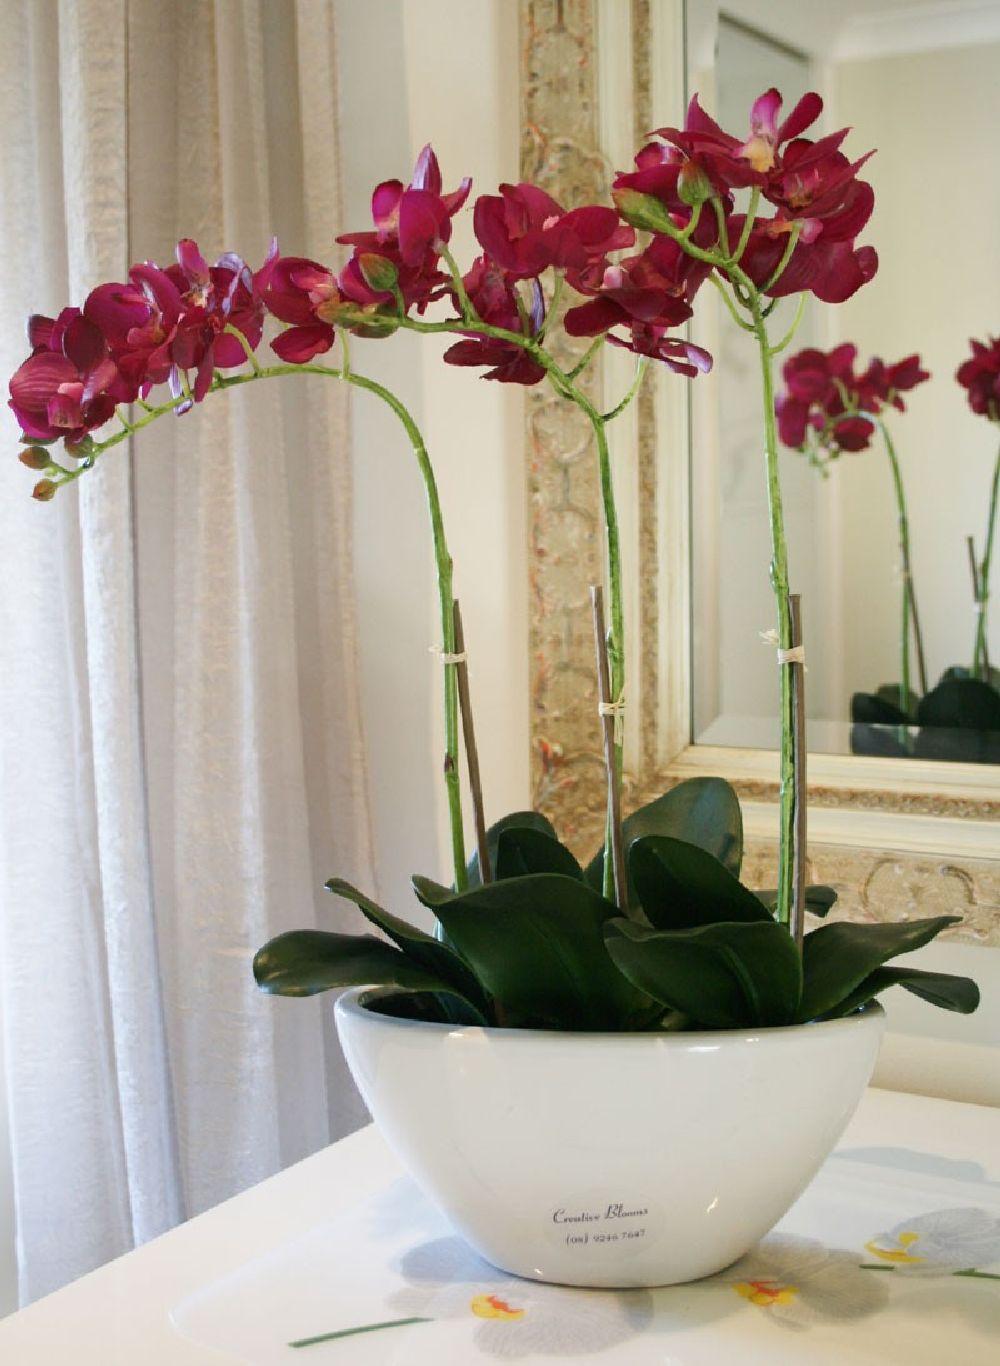 adelaparvu.com despre tratamentul pentru orhideea cu radacini putrezite si frunze ingalbenite, Text Carli Marian (7)